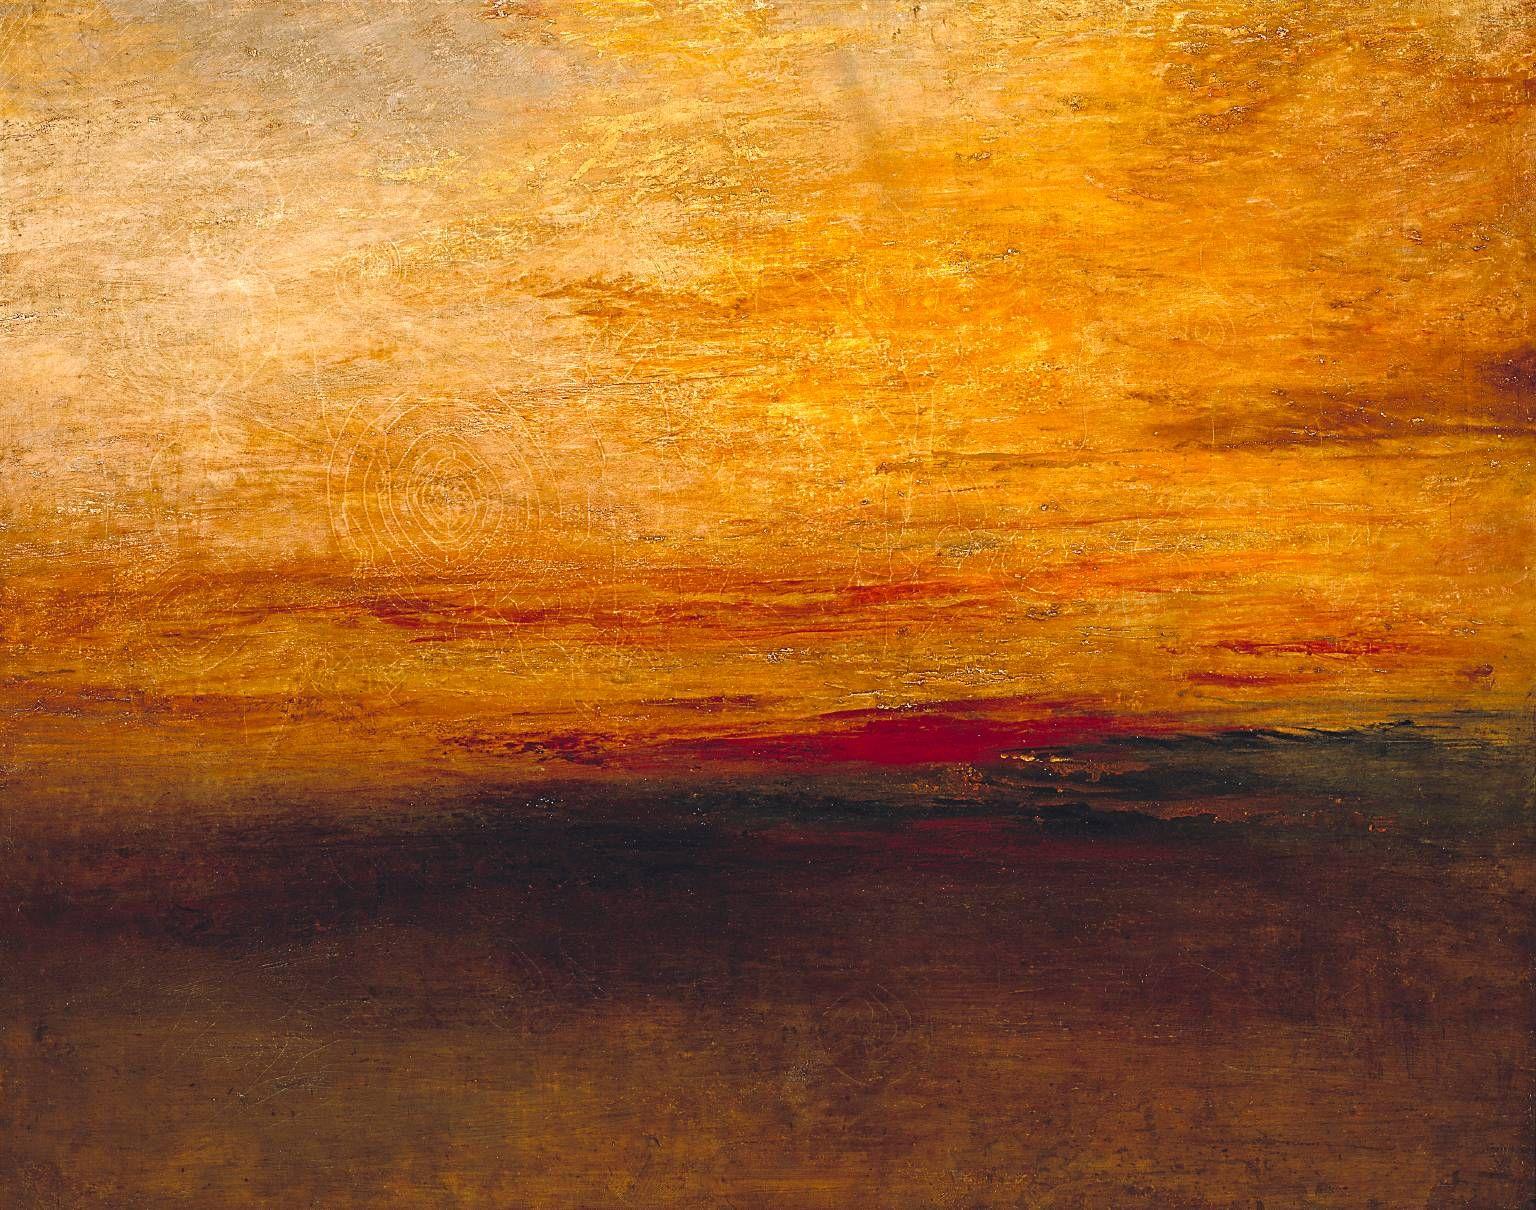 Joseph Mallord William Turner. Sunset, 1835.